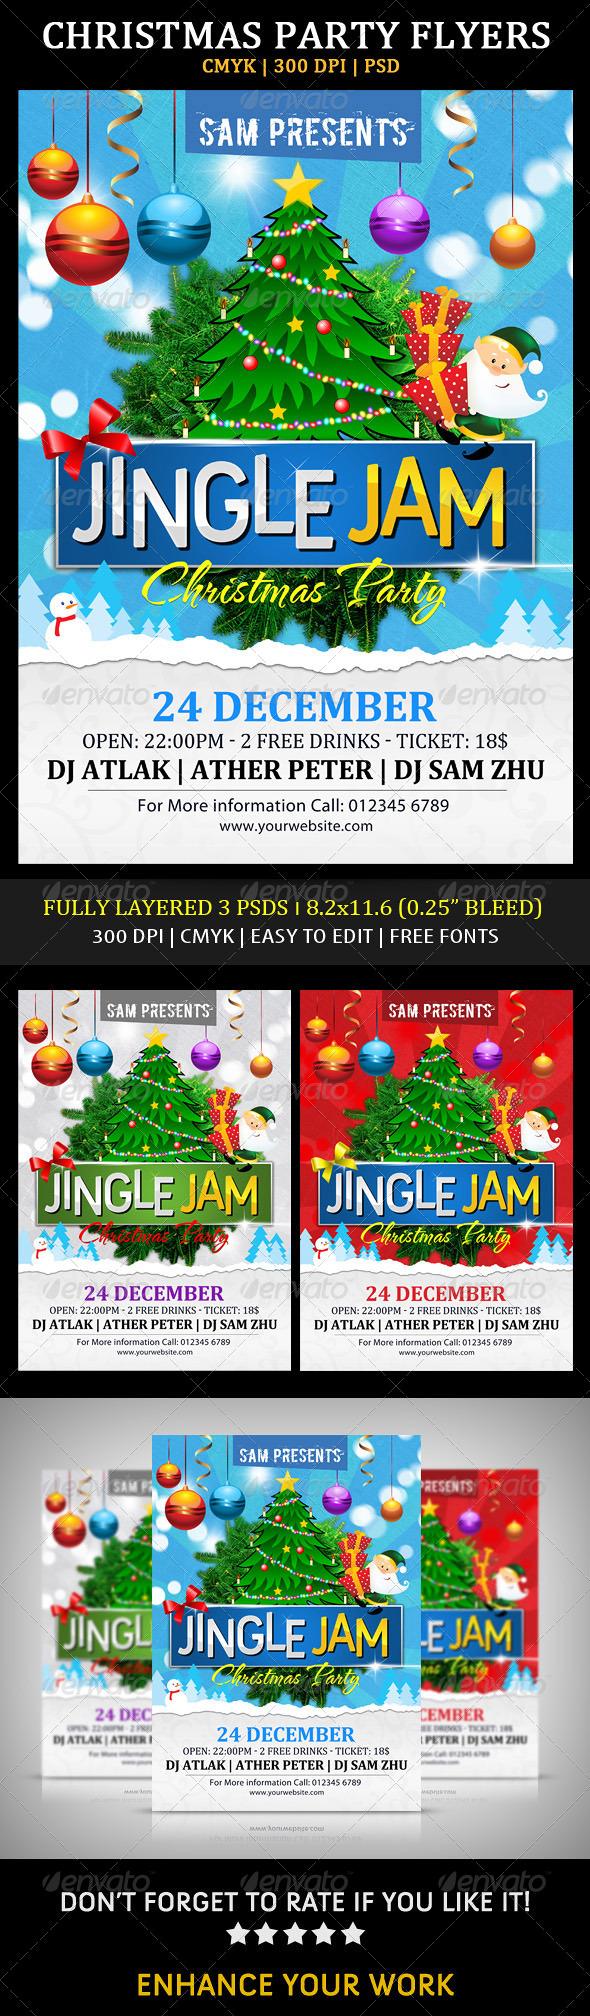 GraphicRiver Jingle Jam Christmas Party Flyers 6136651